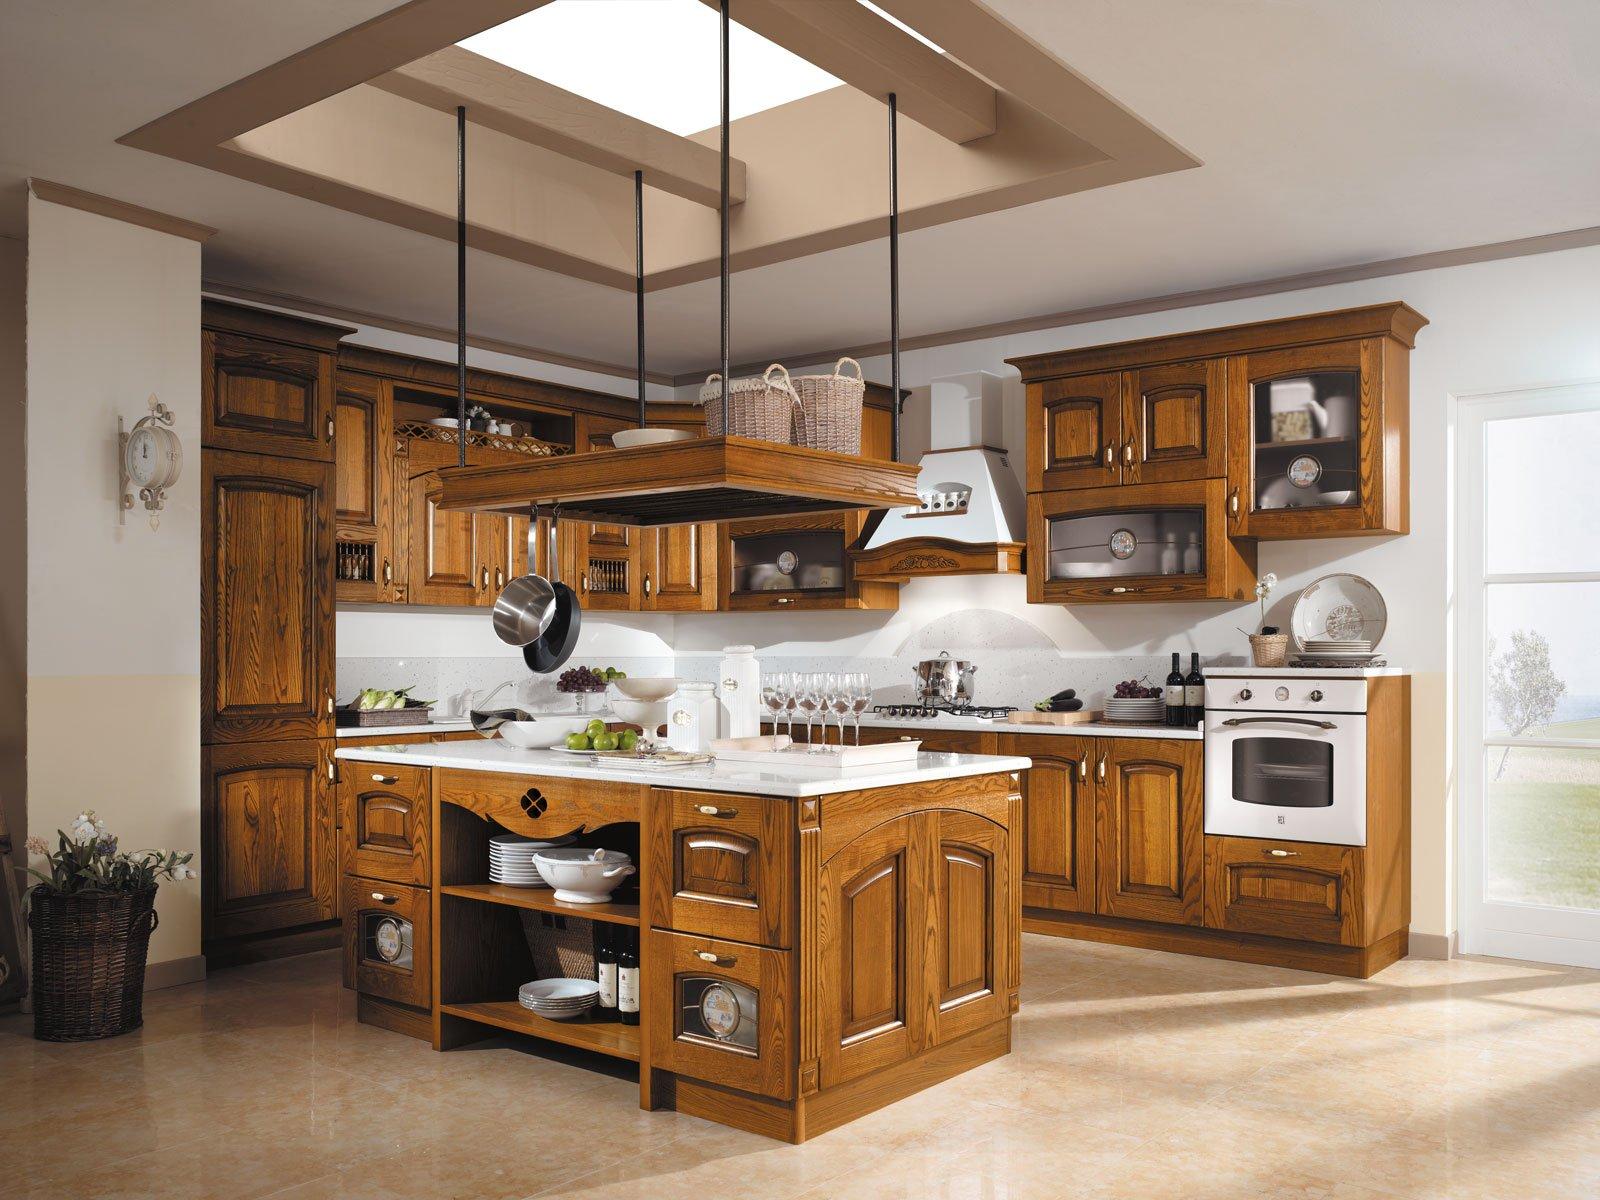 Cucine in legno tradizionali country o moderne cose di casa - Cucine country immagini ...